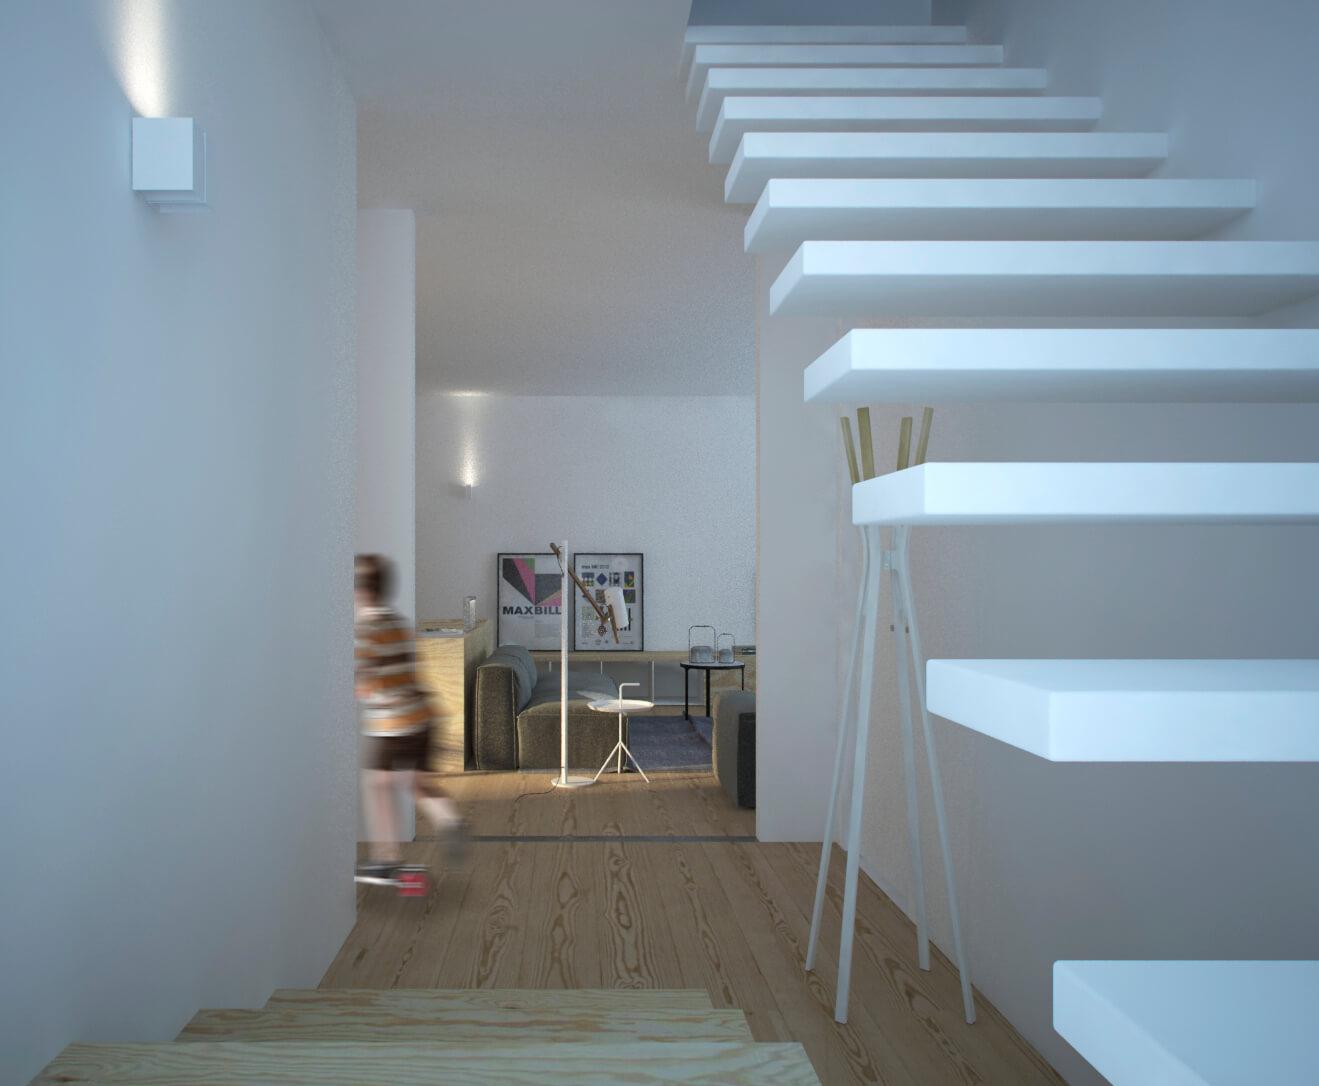 planell-hirsch_arquitectura_interiorismo_rehabilitacion_vivienda_ arcelona_sant andreu 03